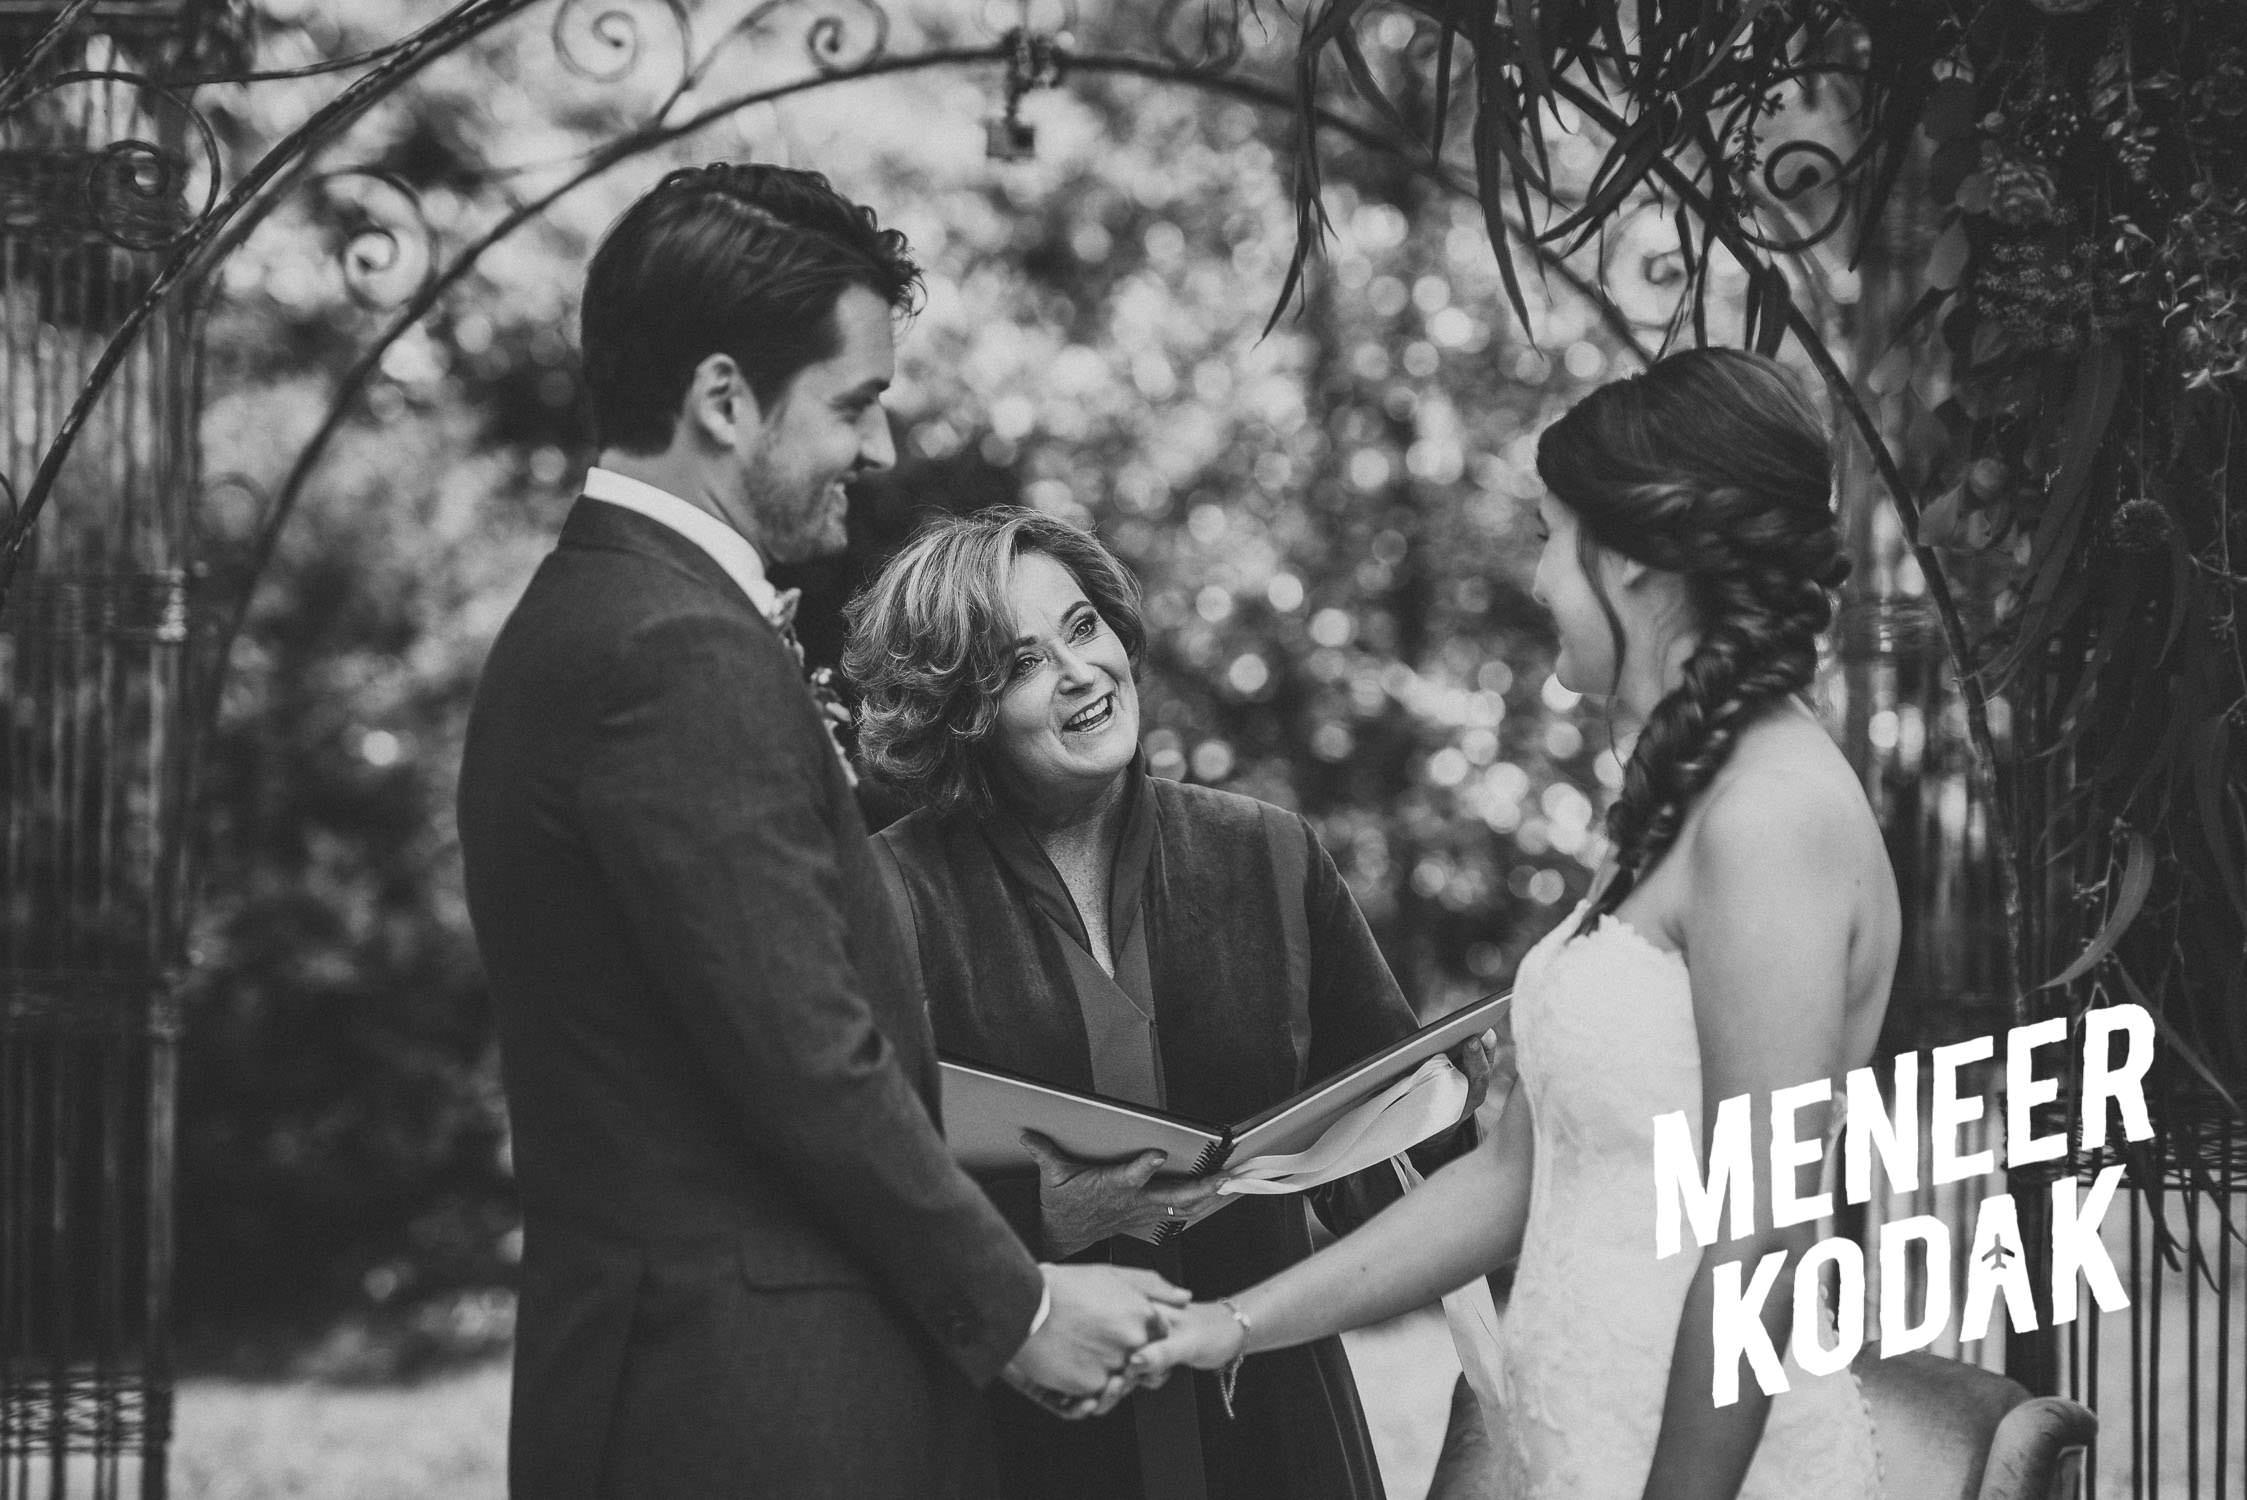 Meneer Kodak - Trouwreportage - Breda - E&M-110.jpg